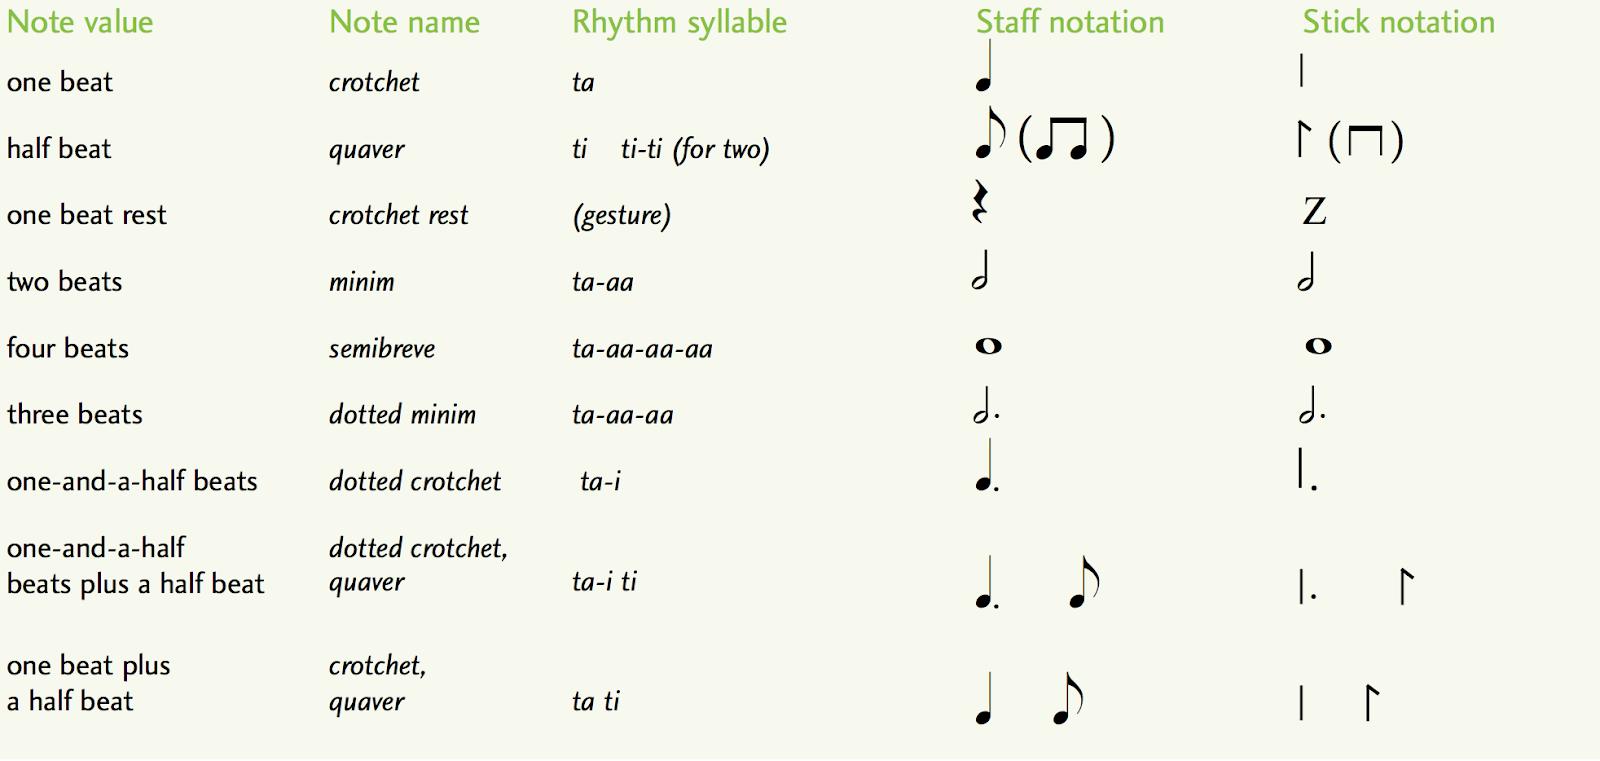 Stick notation - primary school music curriculum Ireland